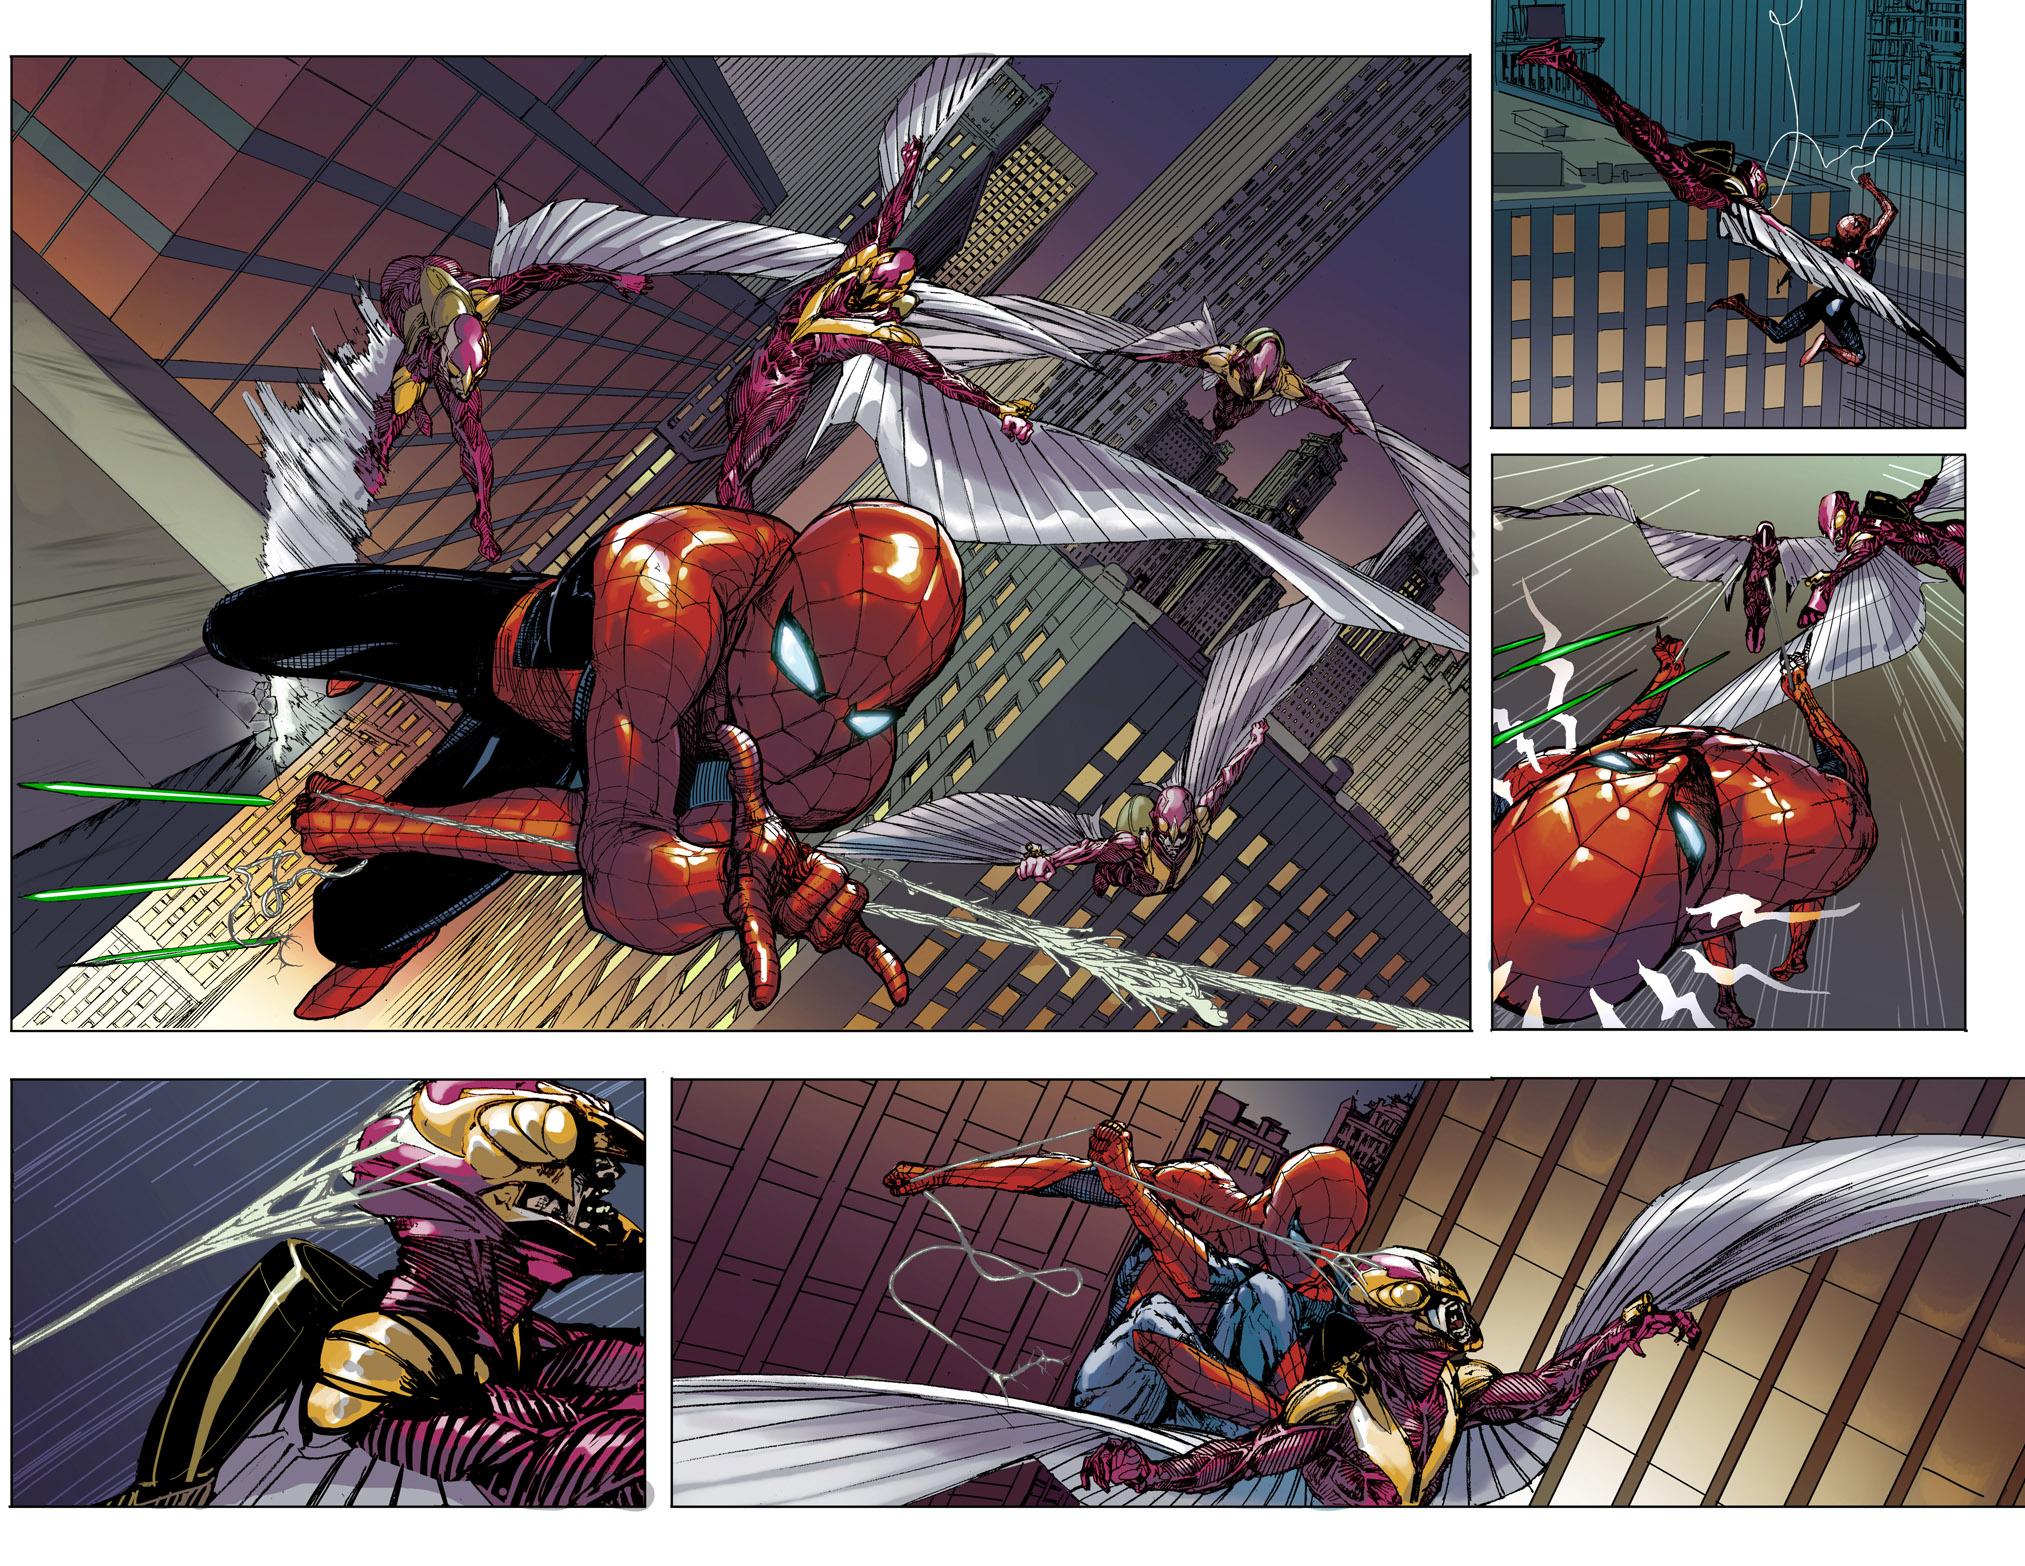 Spider-Man Comes to Civil War II